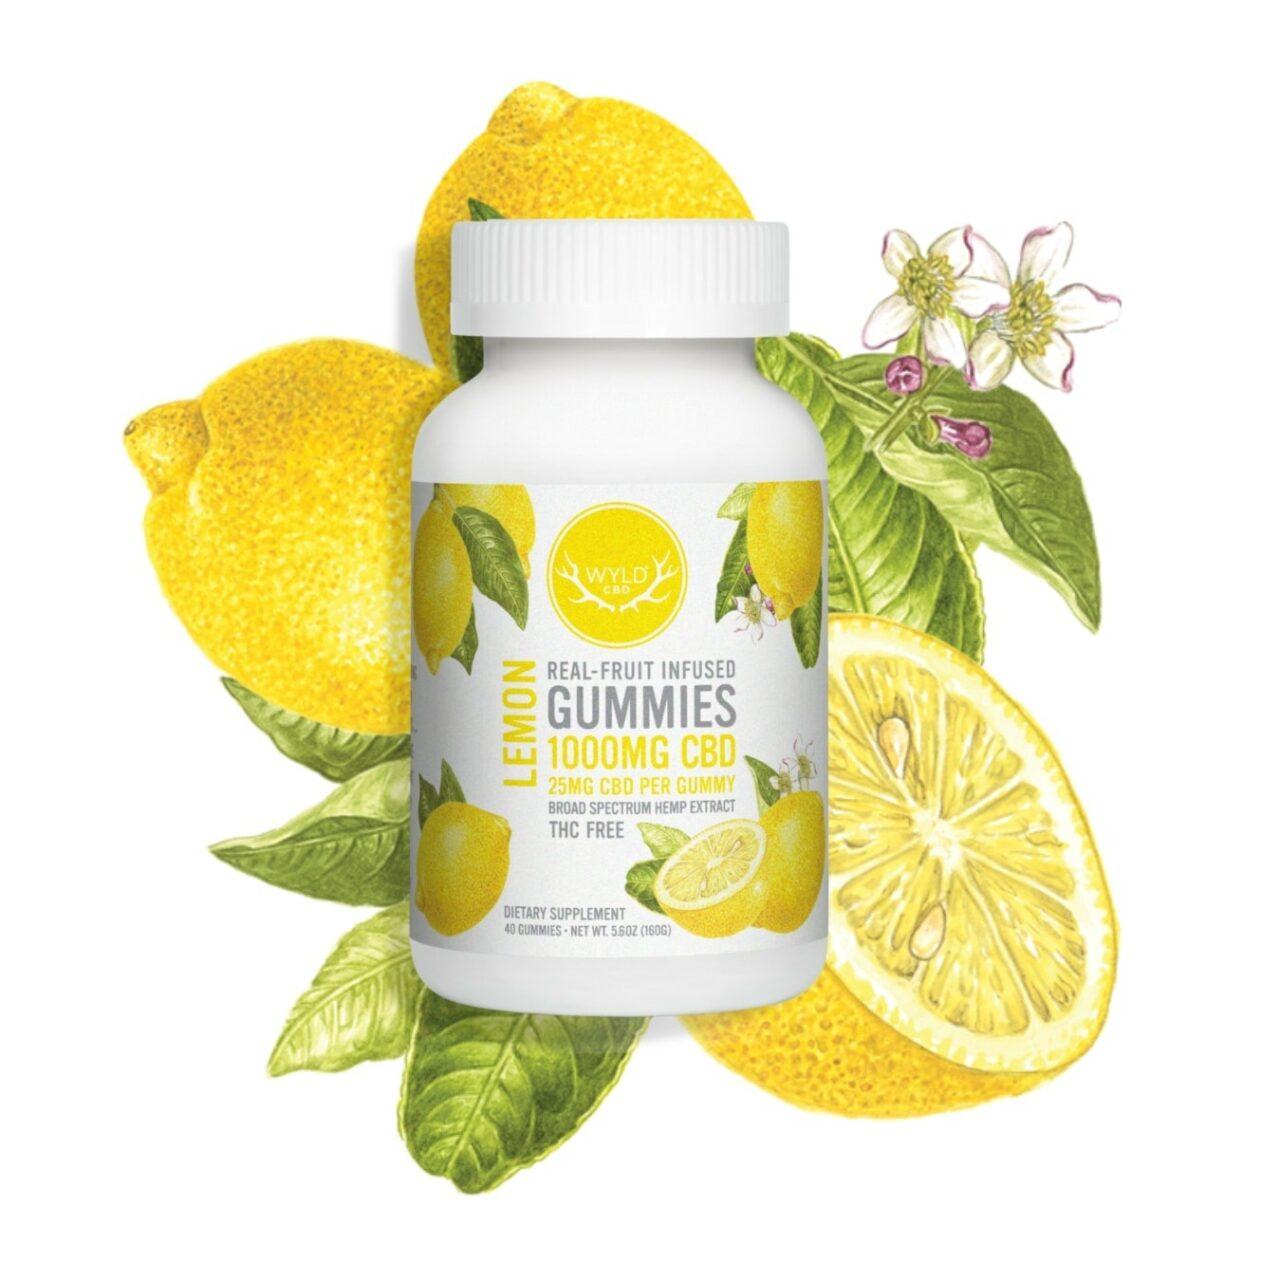 Wyld CBD, Lemon Gummies, Broad Spectrum THC-Free, 40ct, 1000mg CBD